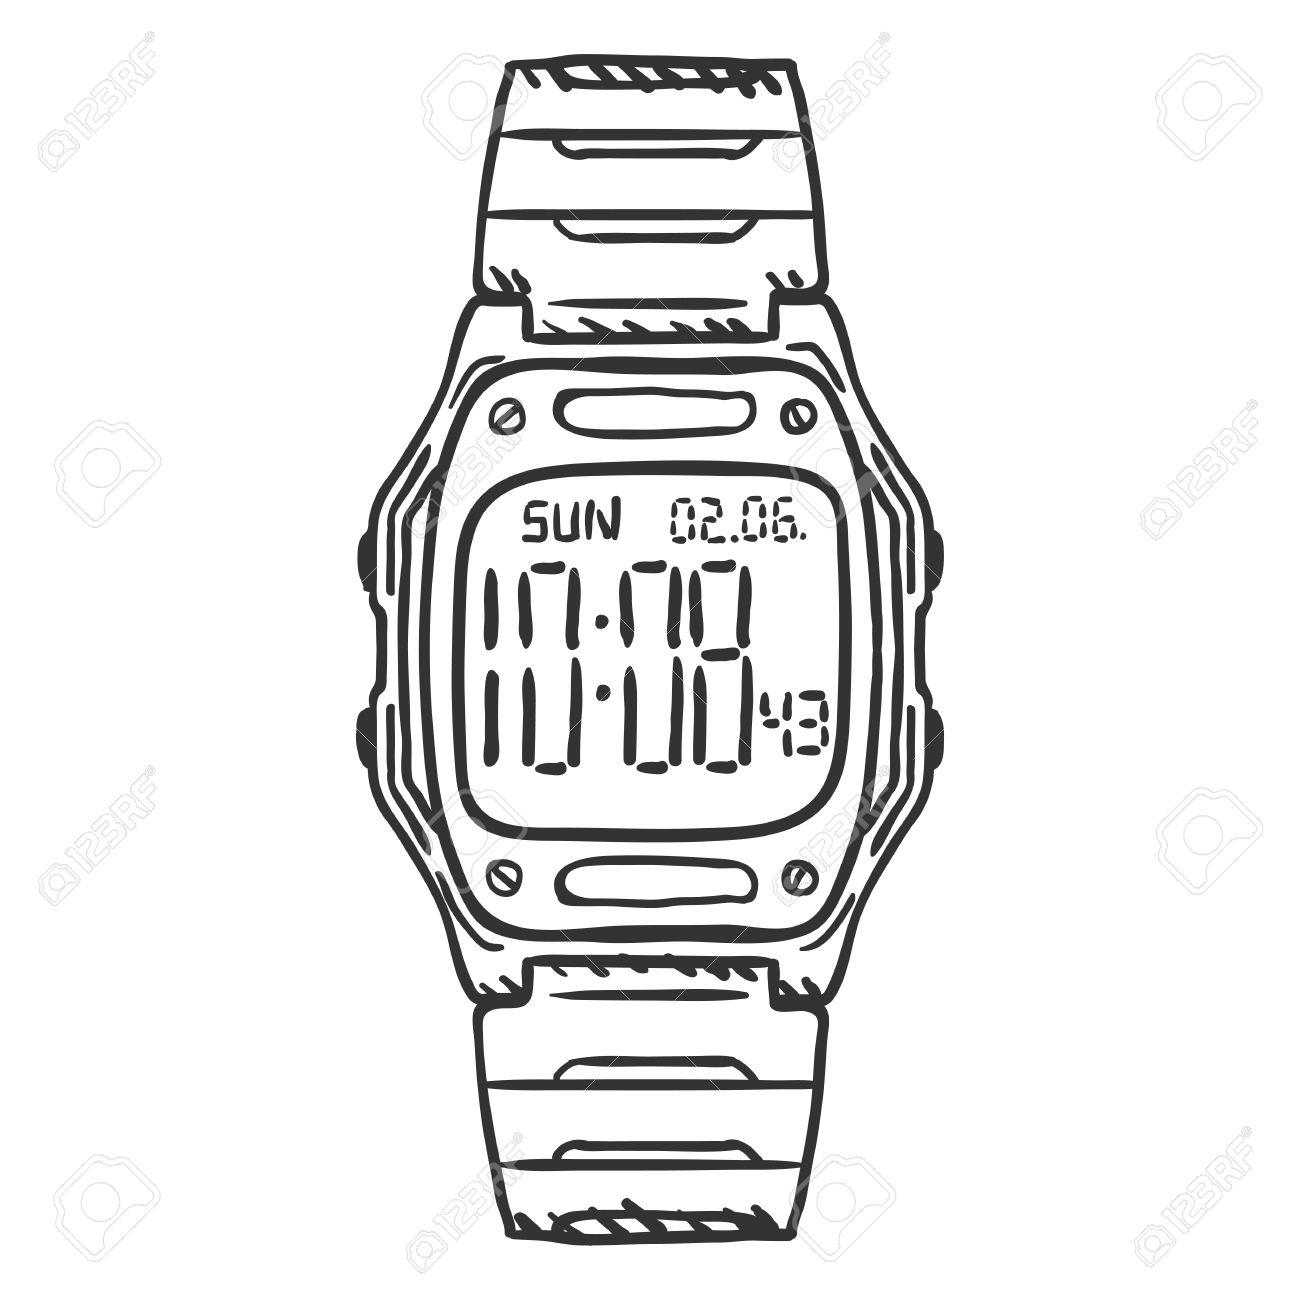 1300x1300 Vector Sketch Classic Digital Wrist Watch On White Background